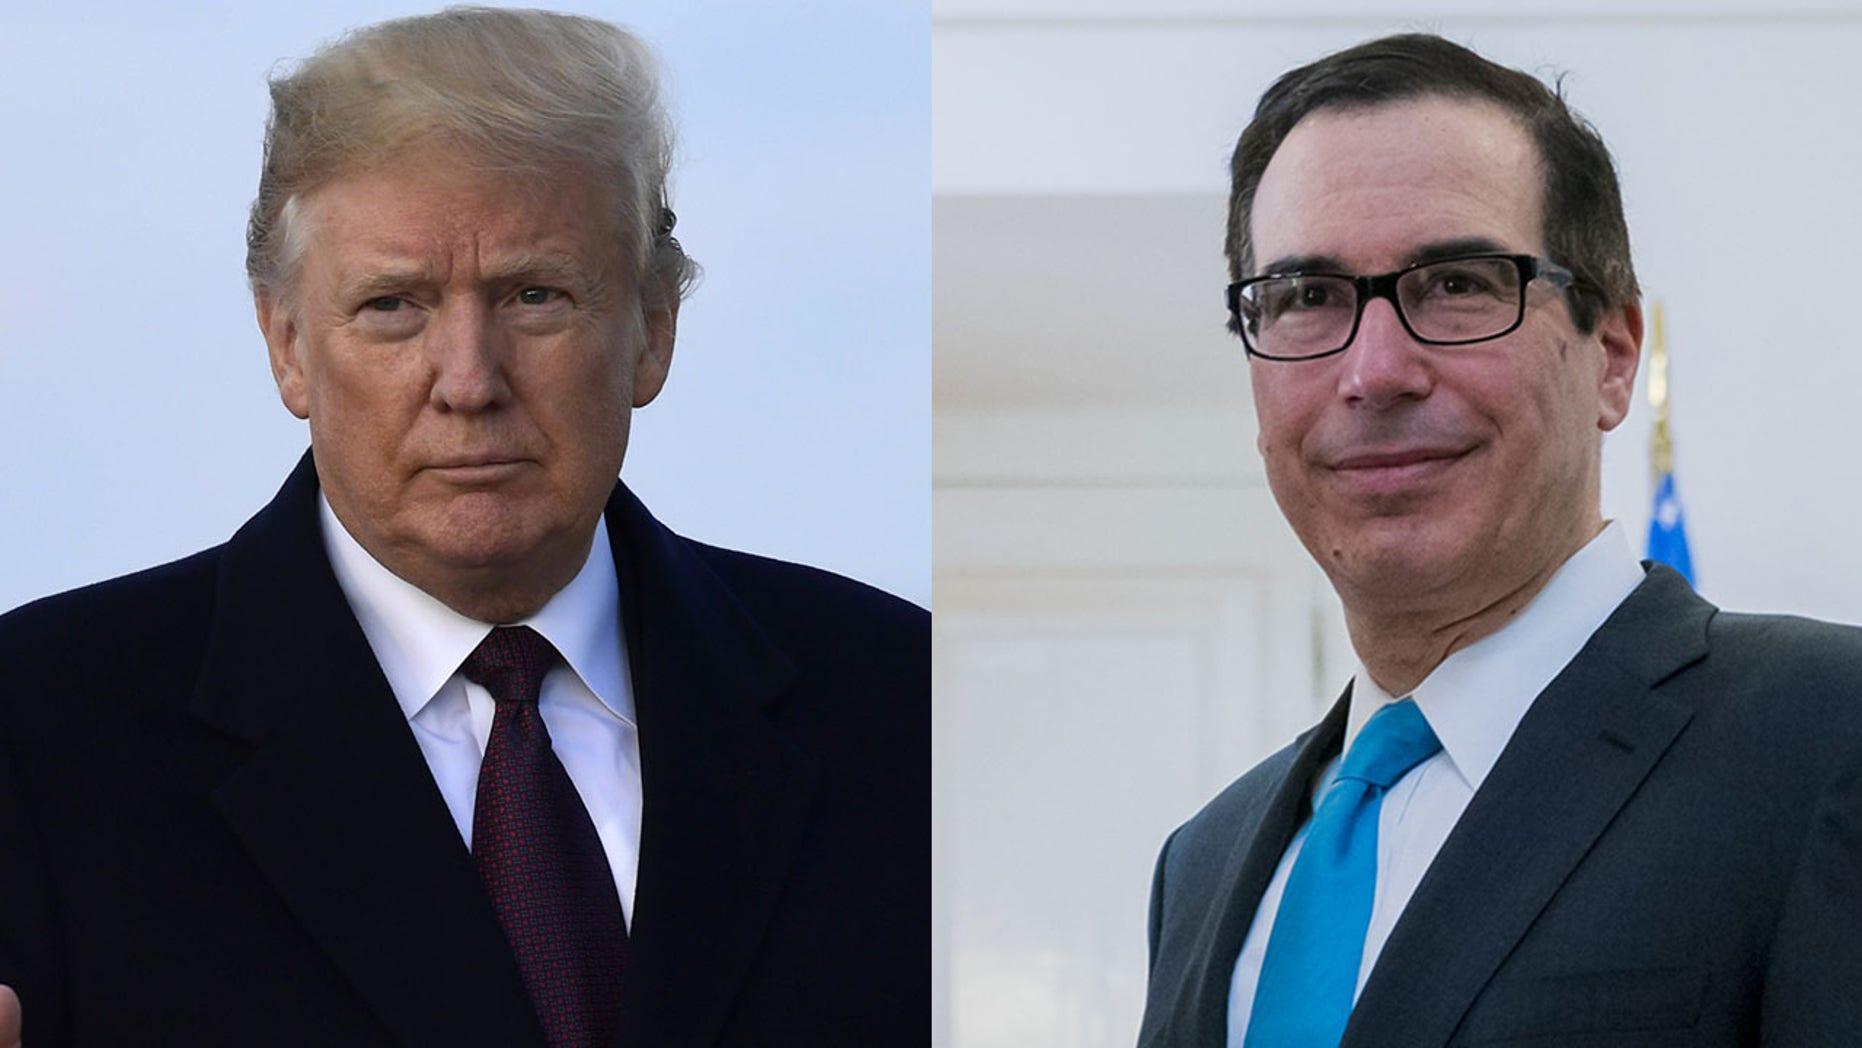 Trump Refutes Reports Alleging Dissatisfaction With Treasury Secretary Mnuchin